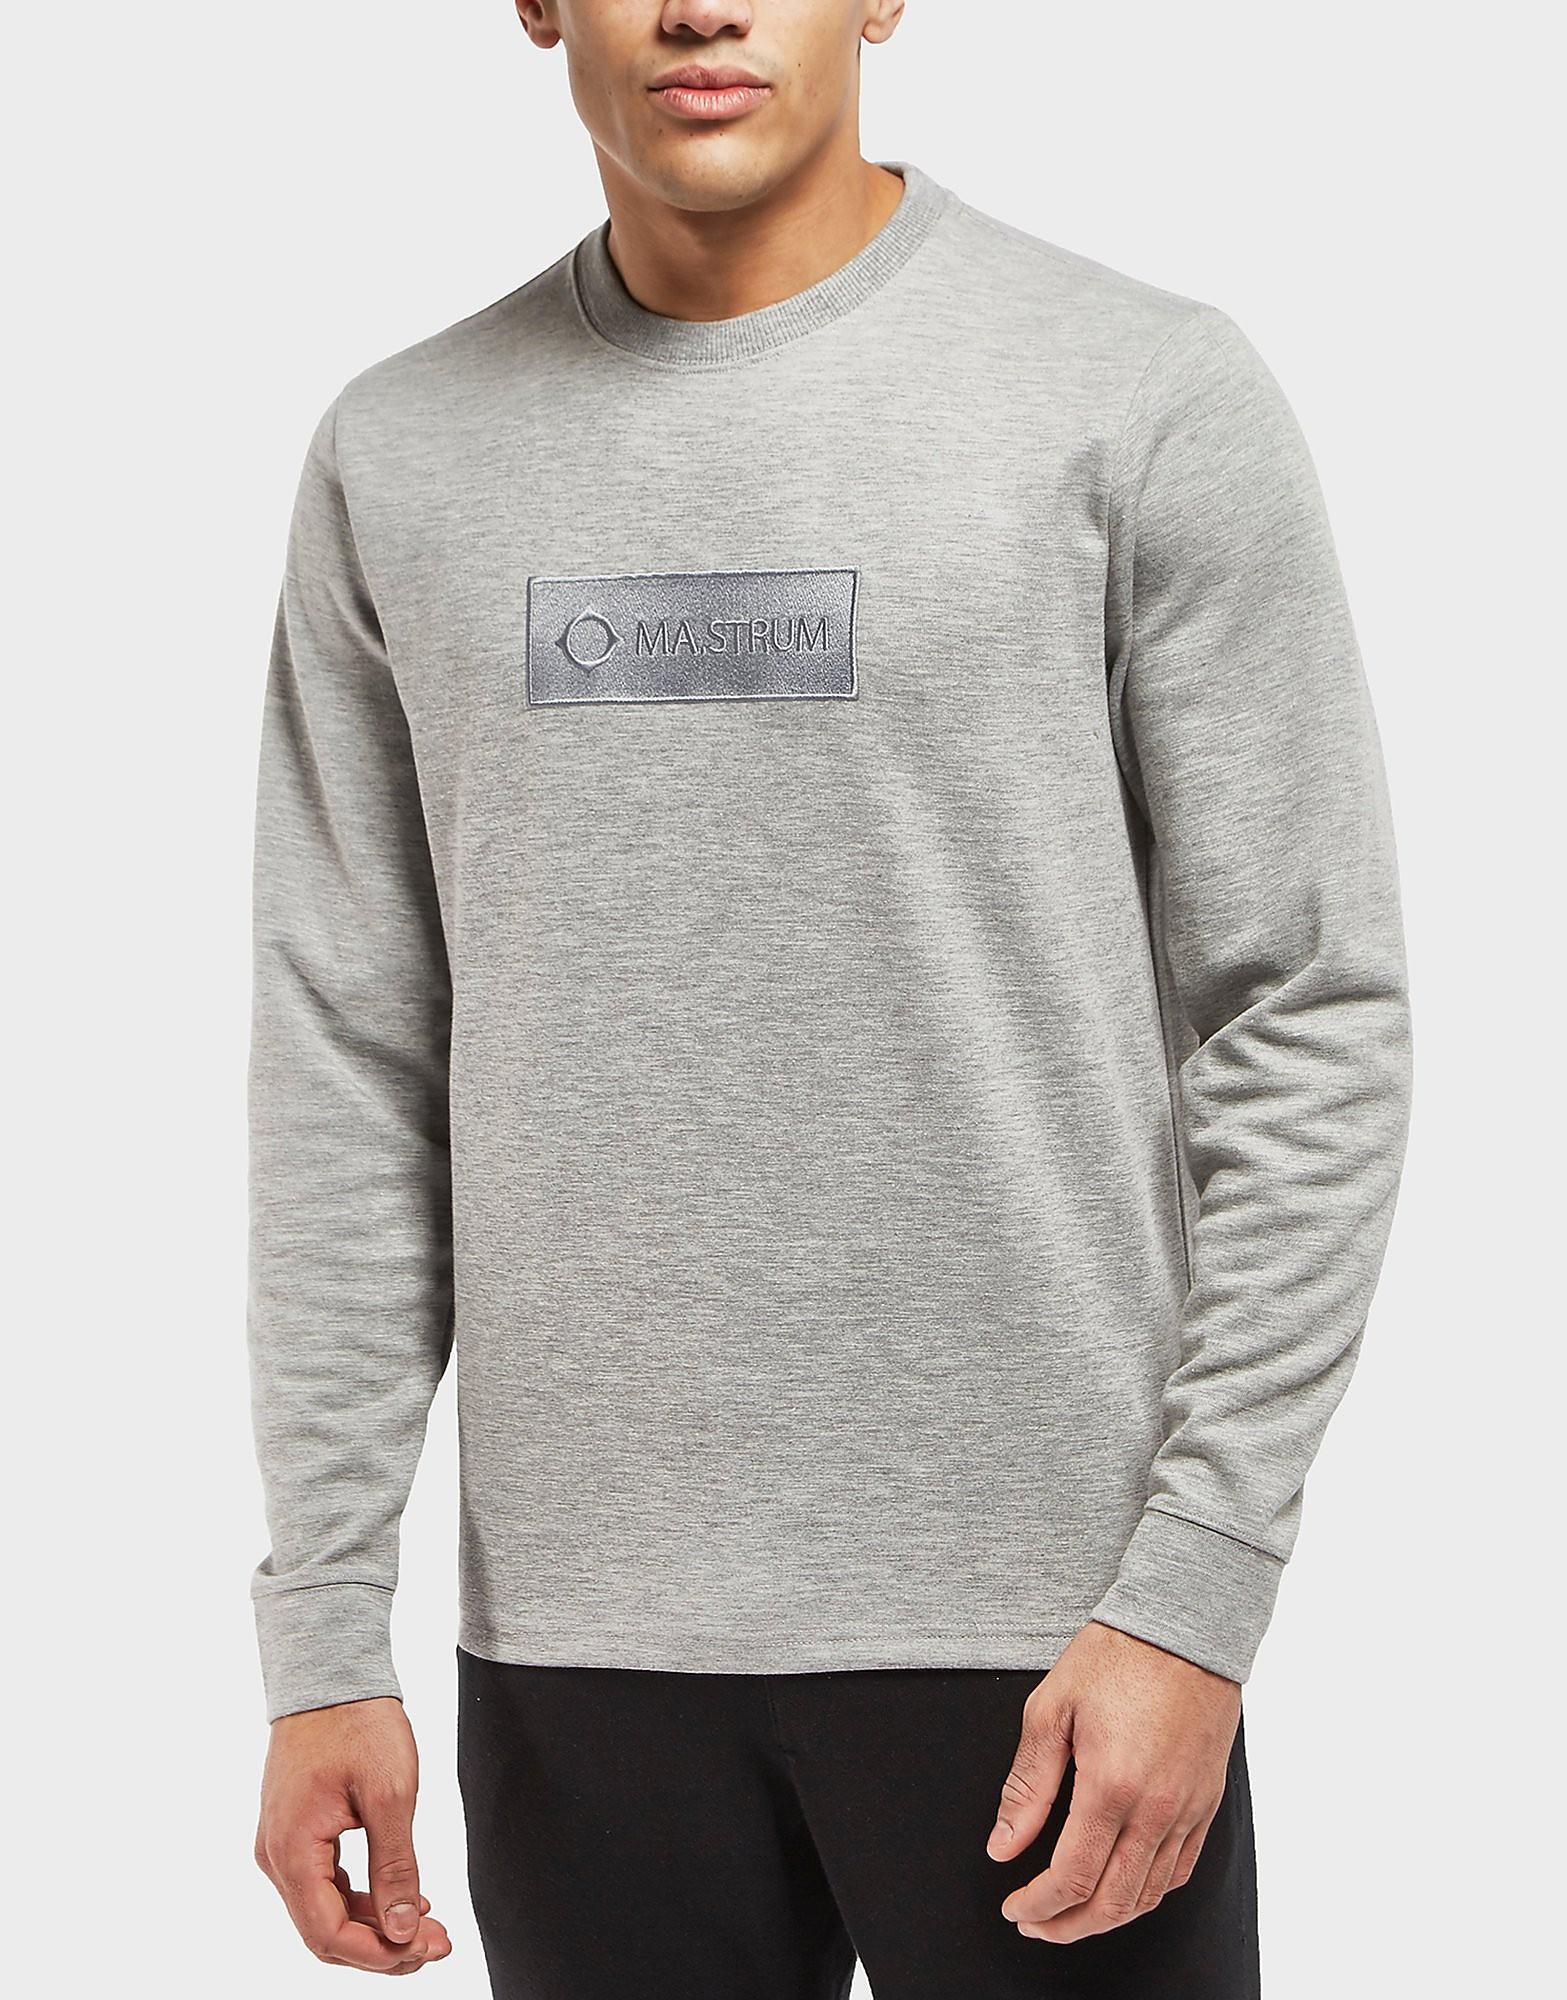 MA STRUM Box Logo Crew Sweatshirt